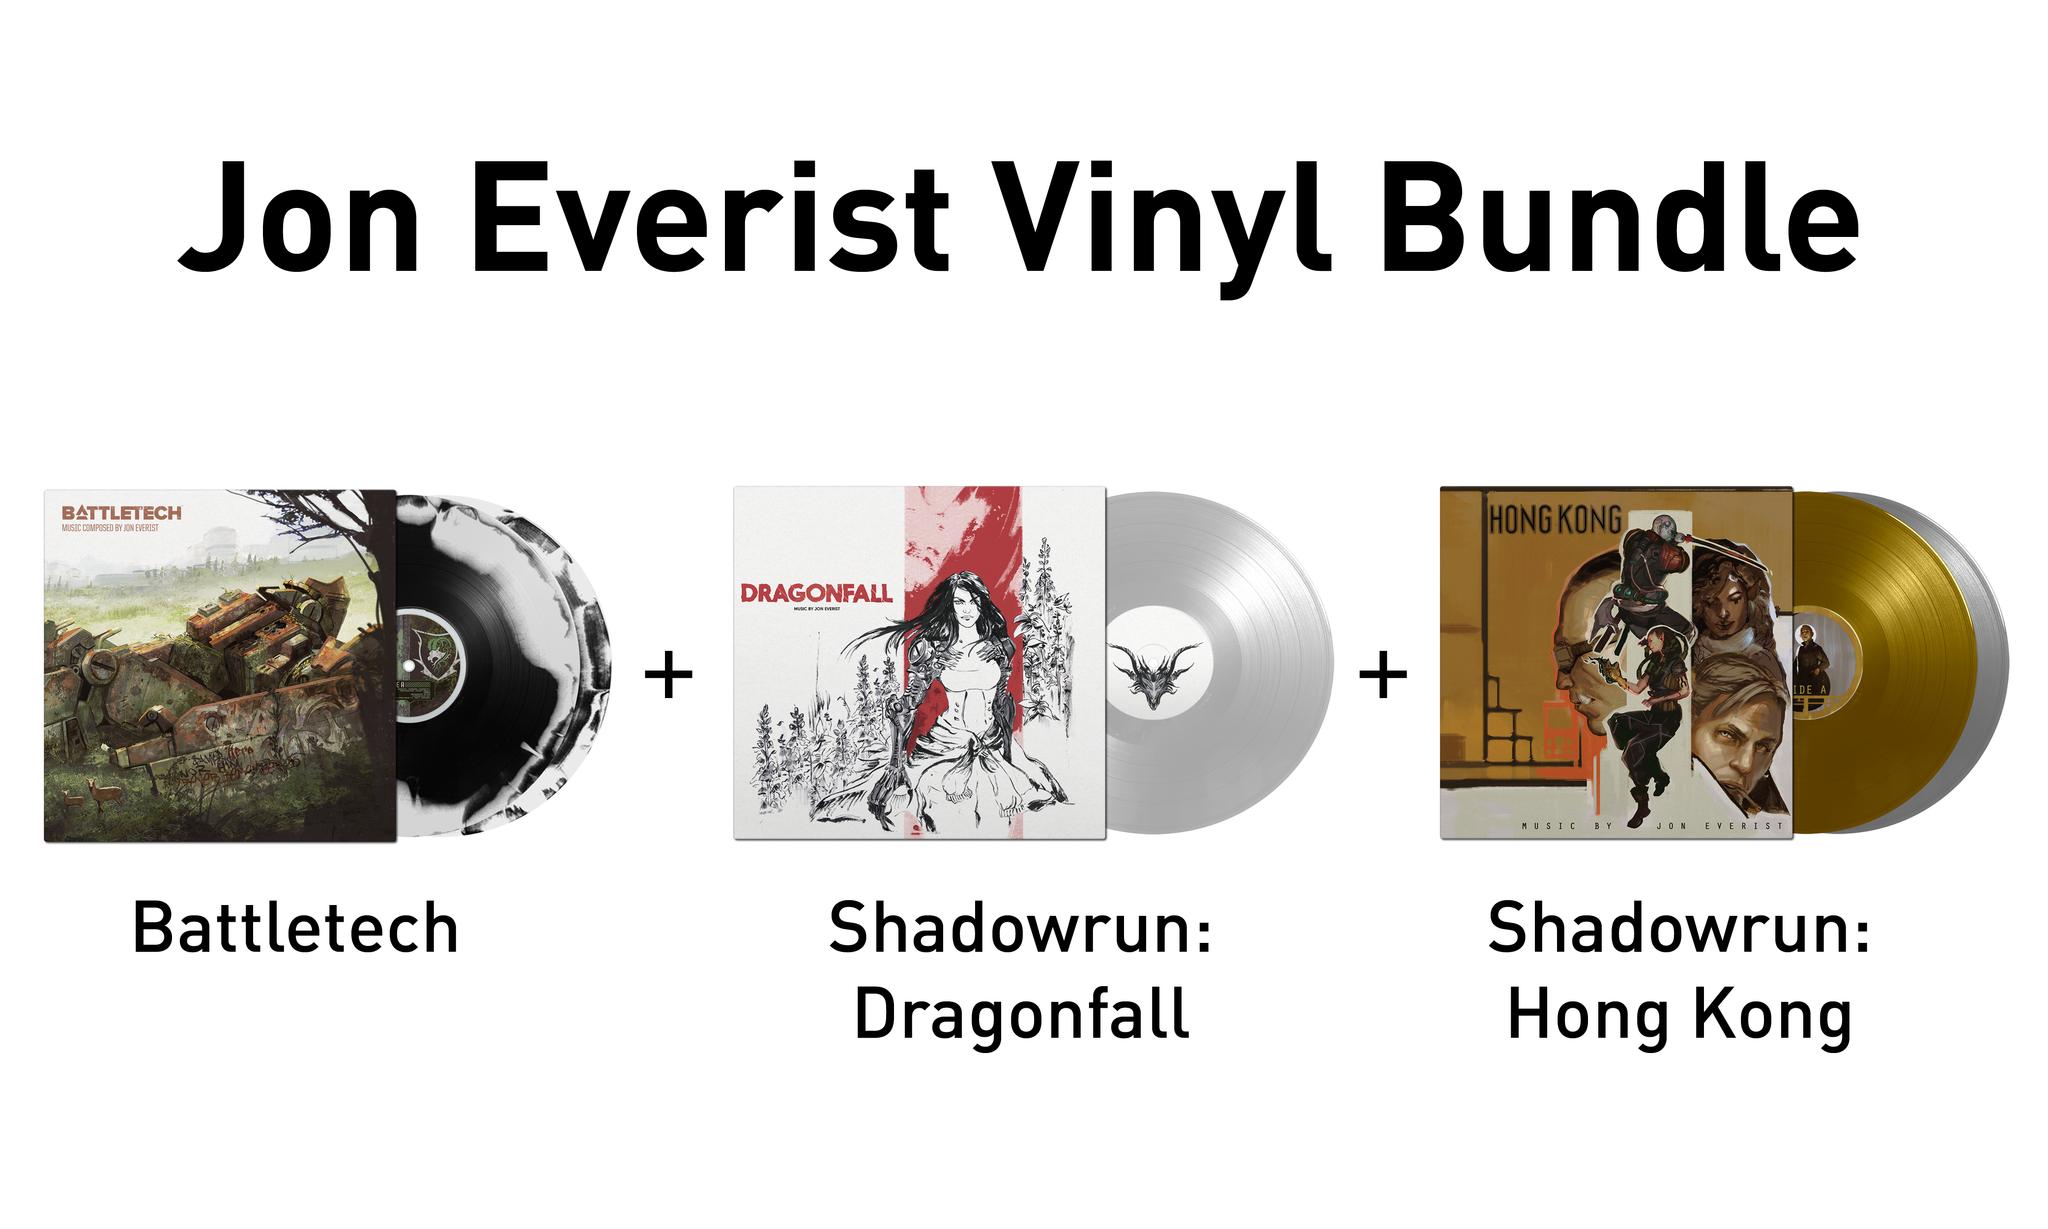 Jon_Everist_Vinyl_Bundle_1024x1024@2x.png